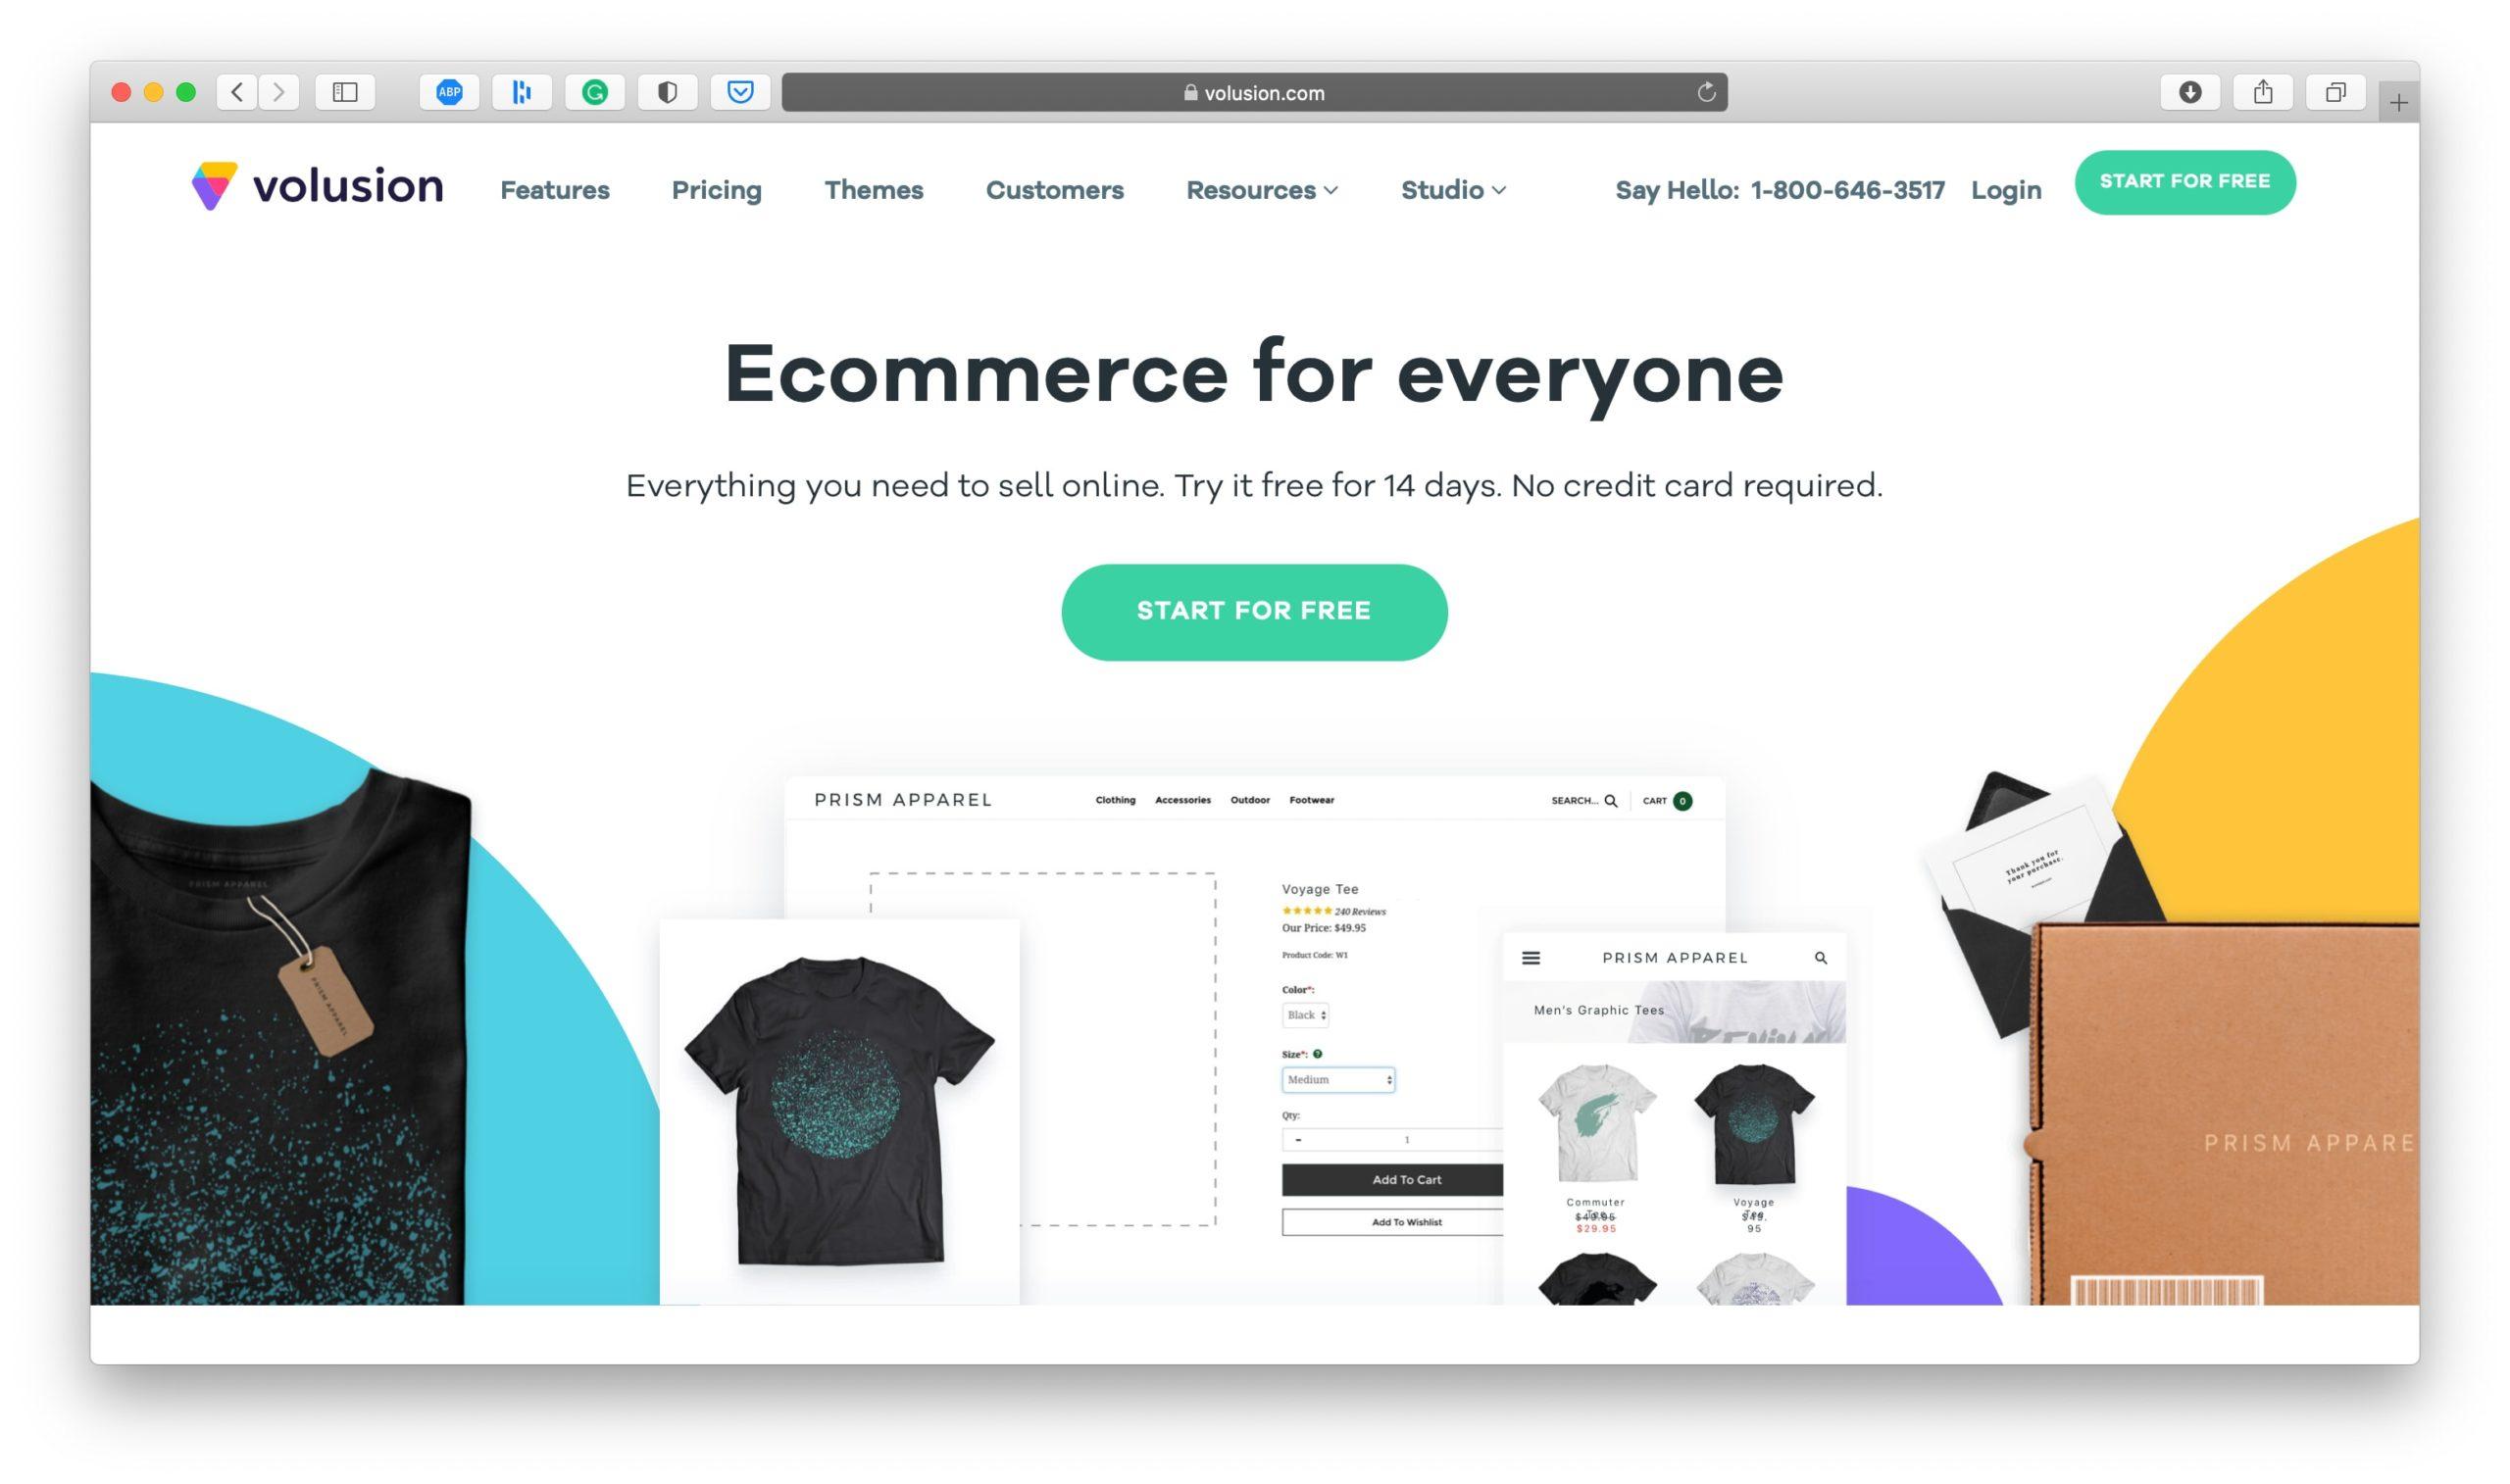 Volusion Ecommerce Platform Homepage